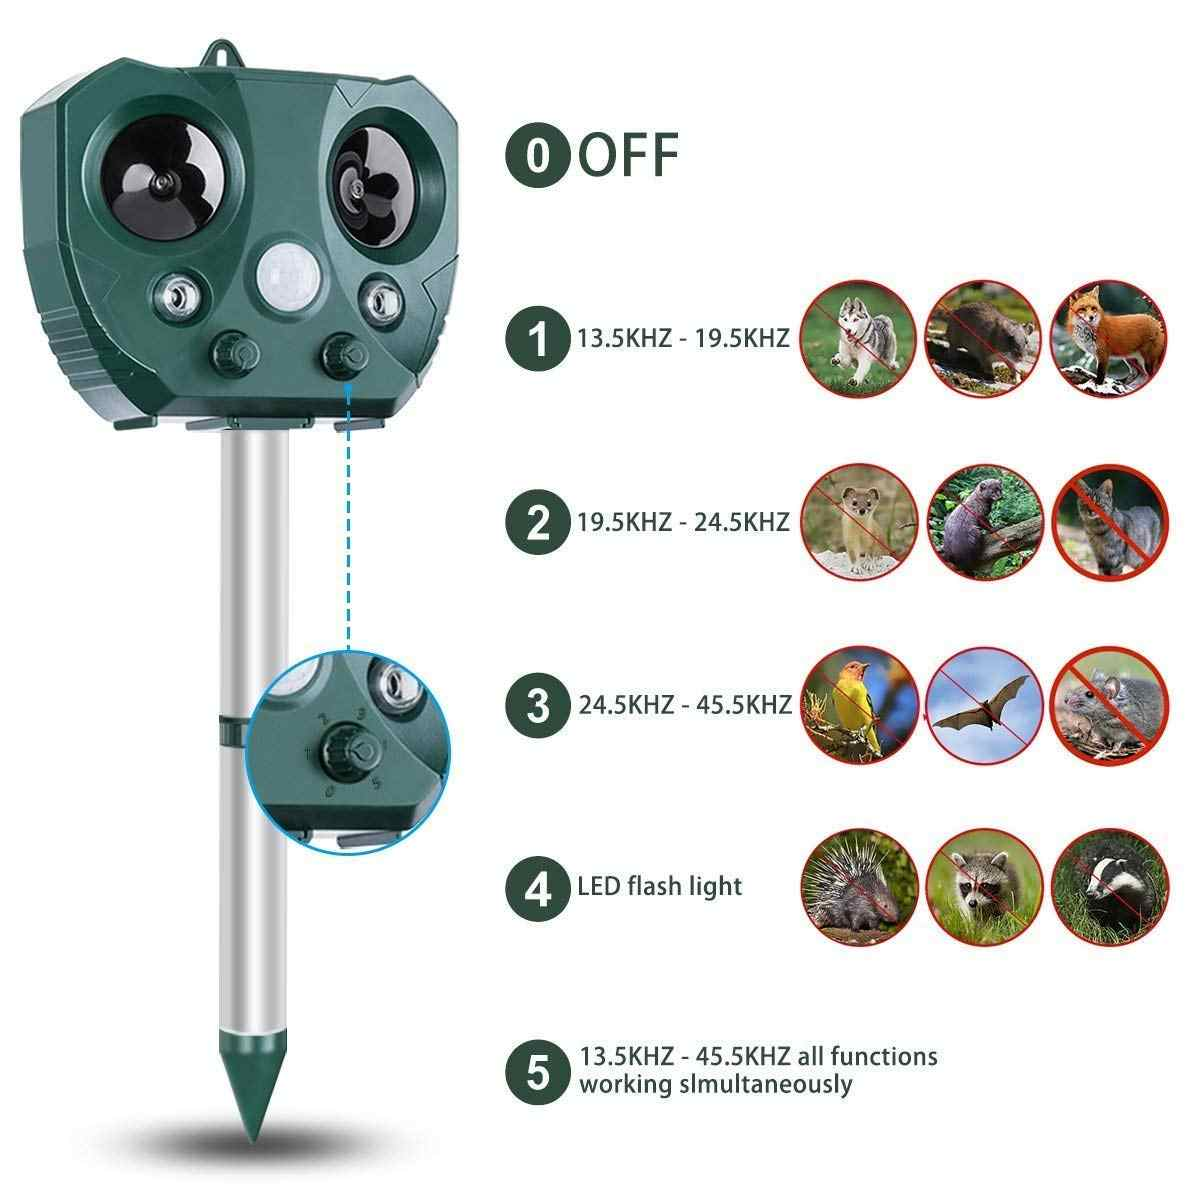 KCASA 정원 태양 Repellents 동물 마우스 조류 고양이 애완 동물 강아지 repeller Repeller 컨트롤러 활성화 모션 센서 방수